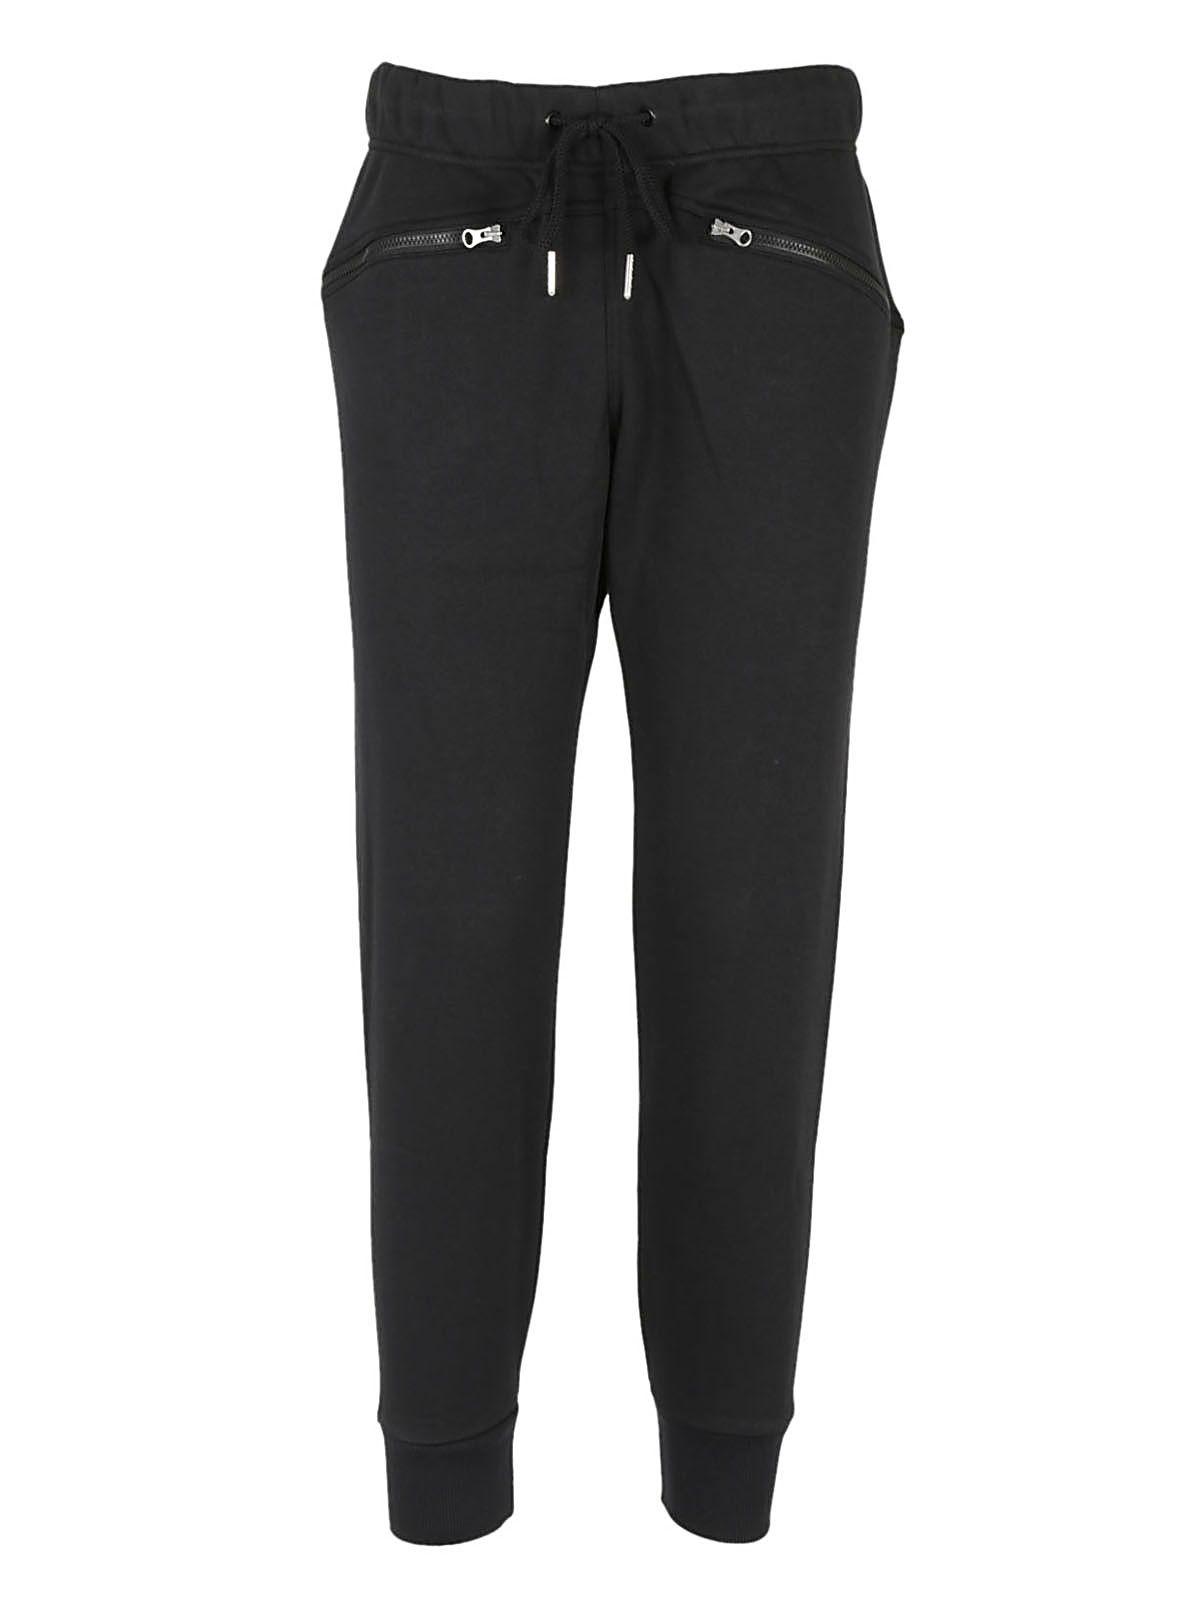 Adidas By Stella Mccartney Classic Track Pants